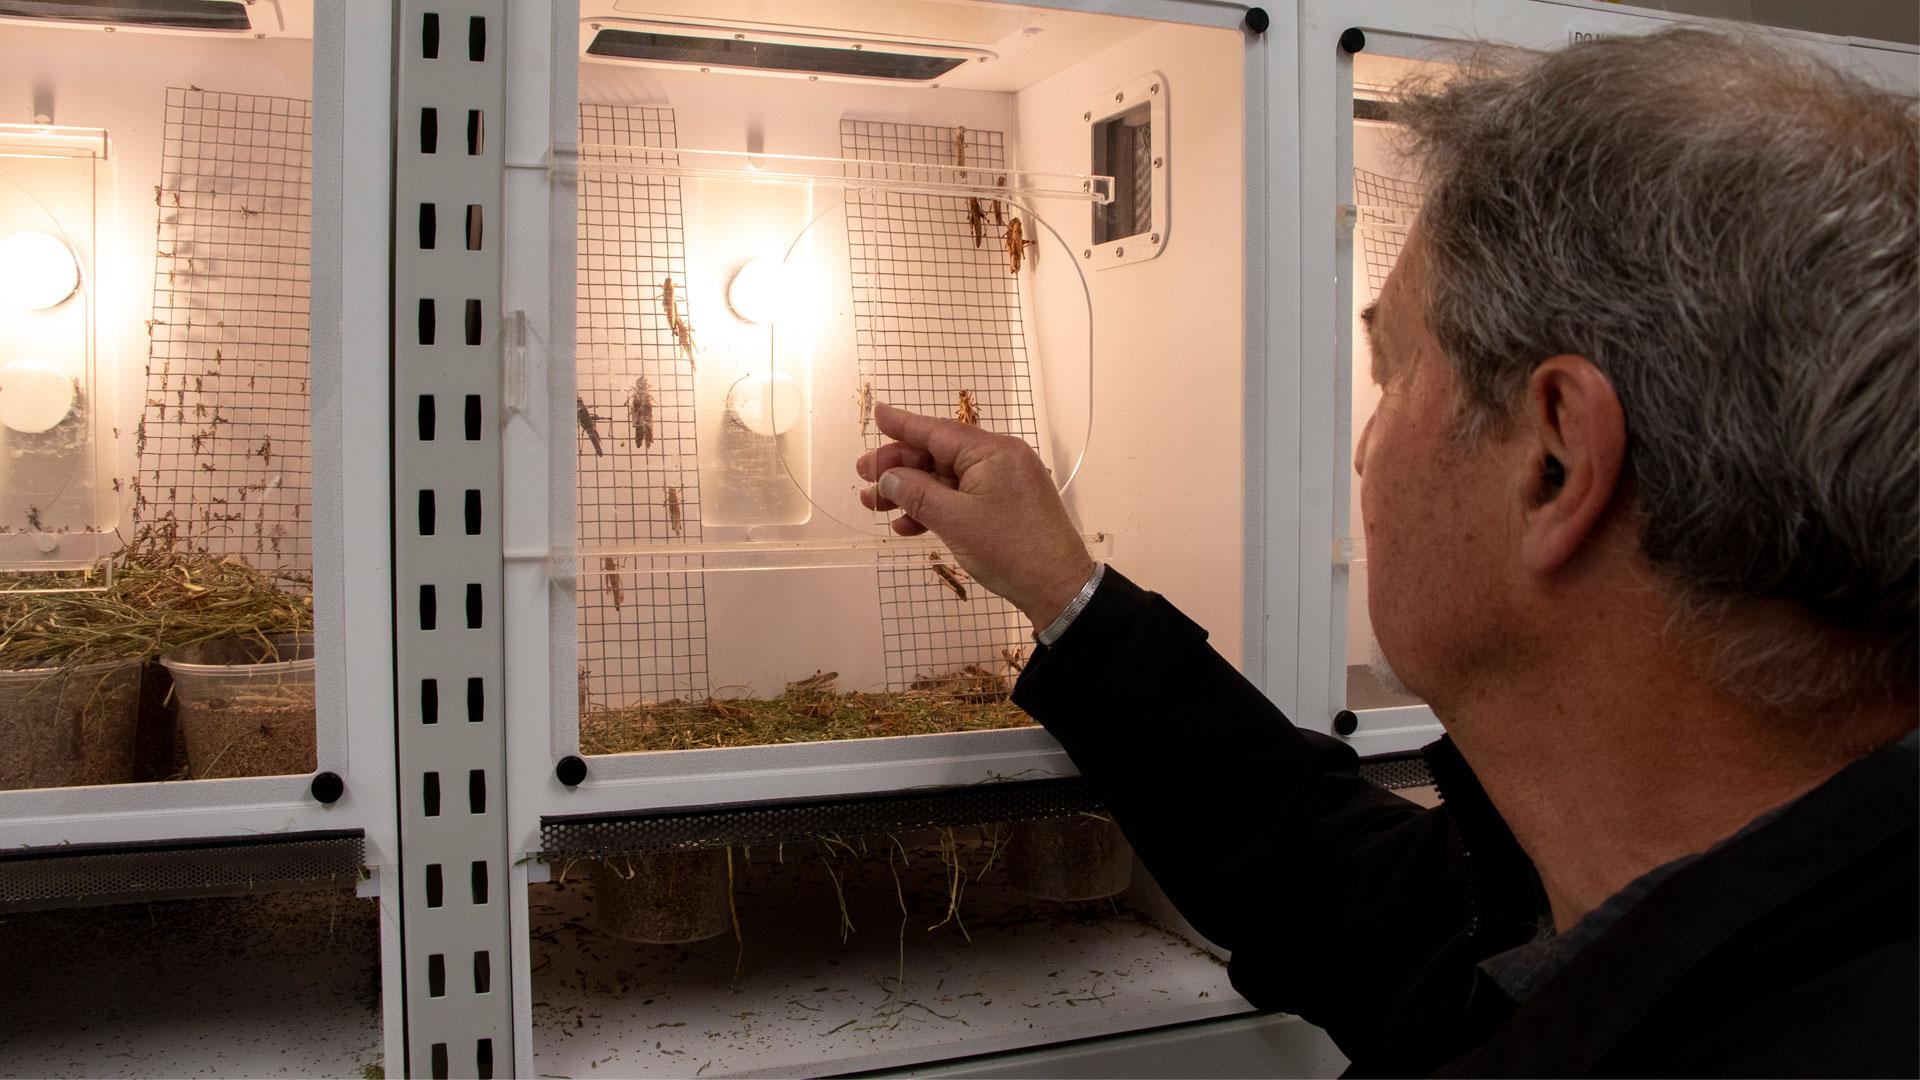 https://rfacdn.nz/zoo/assets/media/insect-portacom-gallery-1.jpg